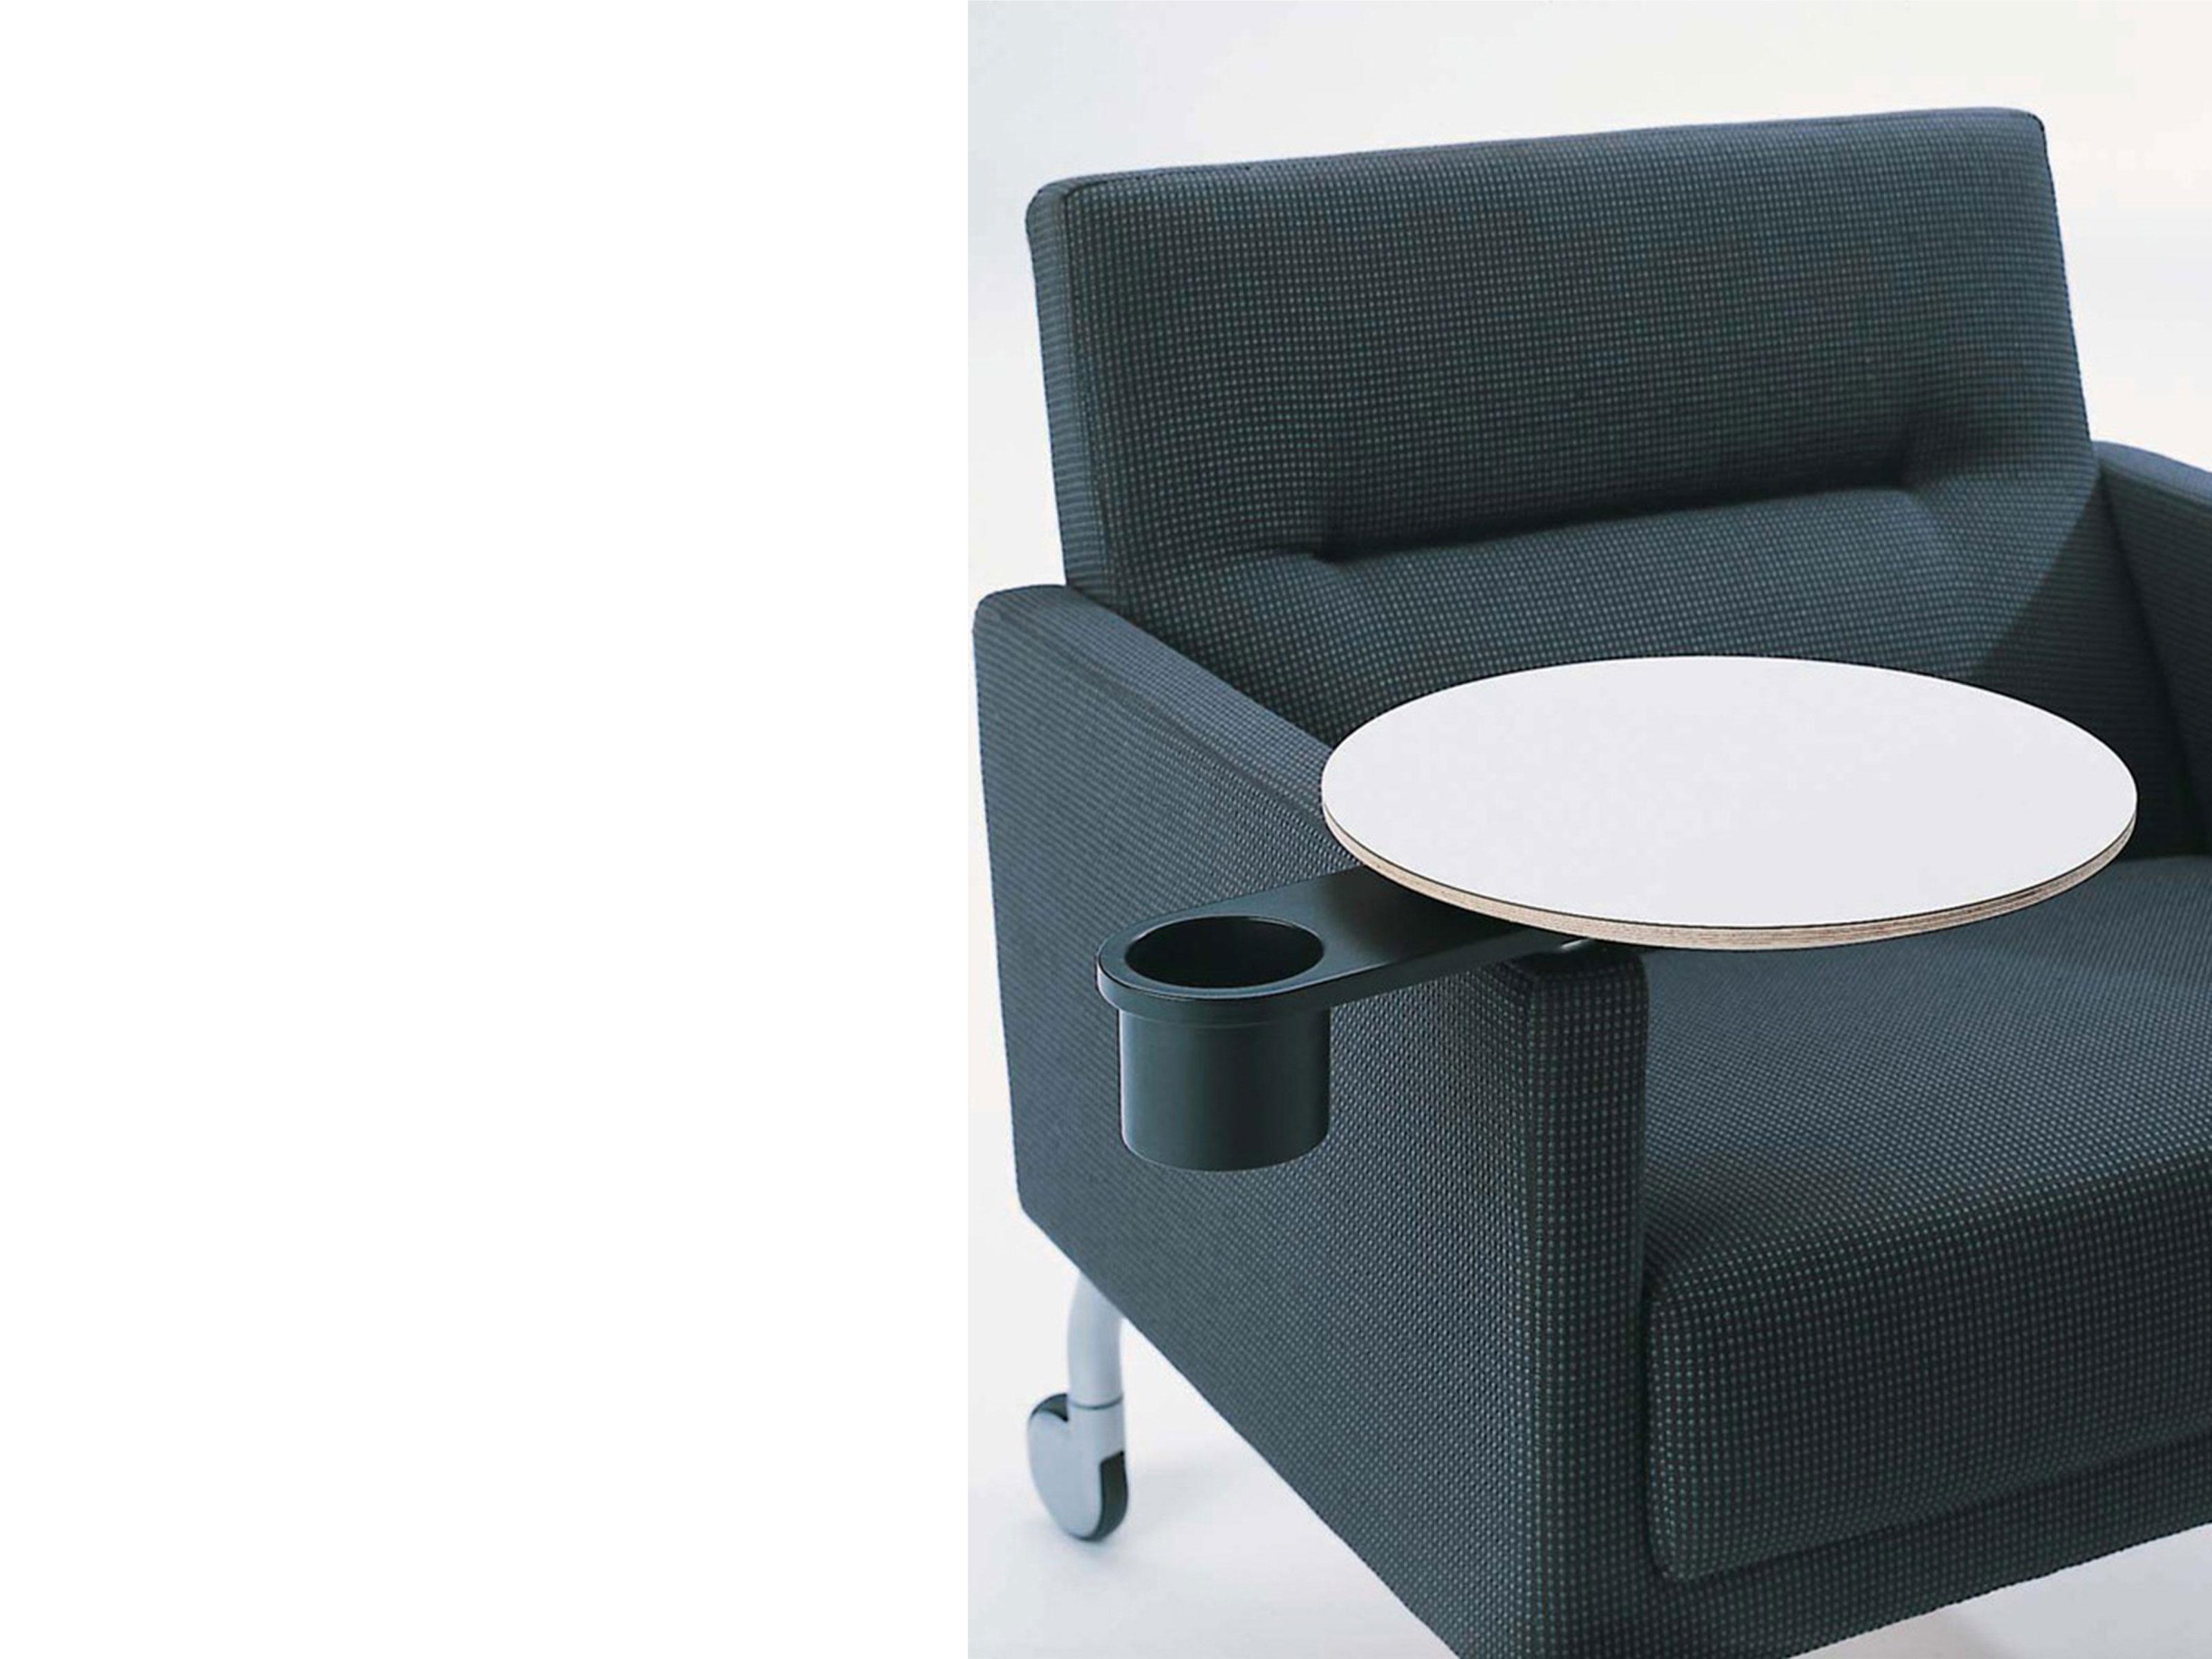 Surprising Coalesse Sidewalk Lounge Portable Seating Steelcase Ibusinesslaw Wood Chair Design Ideas Ibusinesslaworg